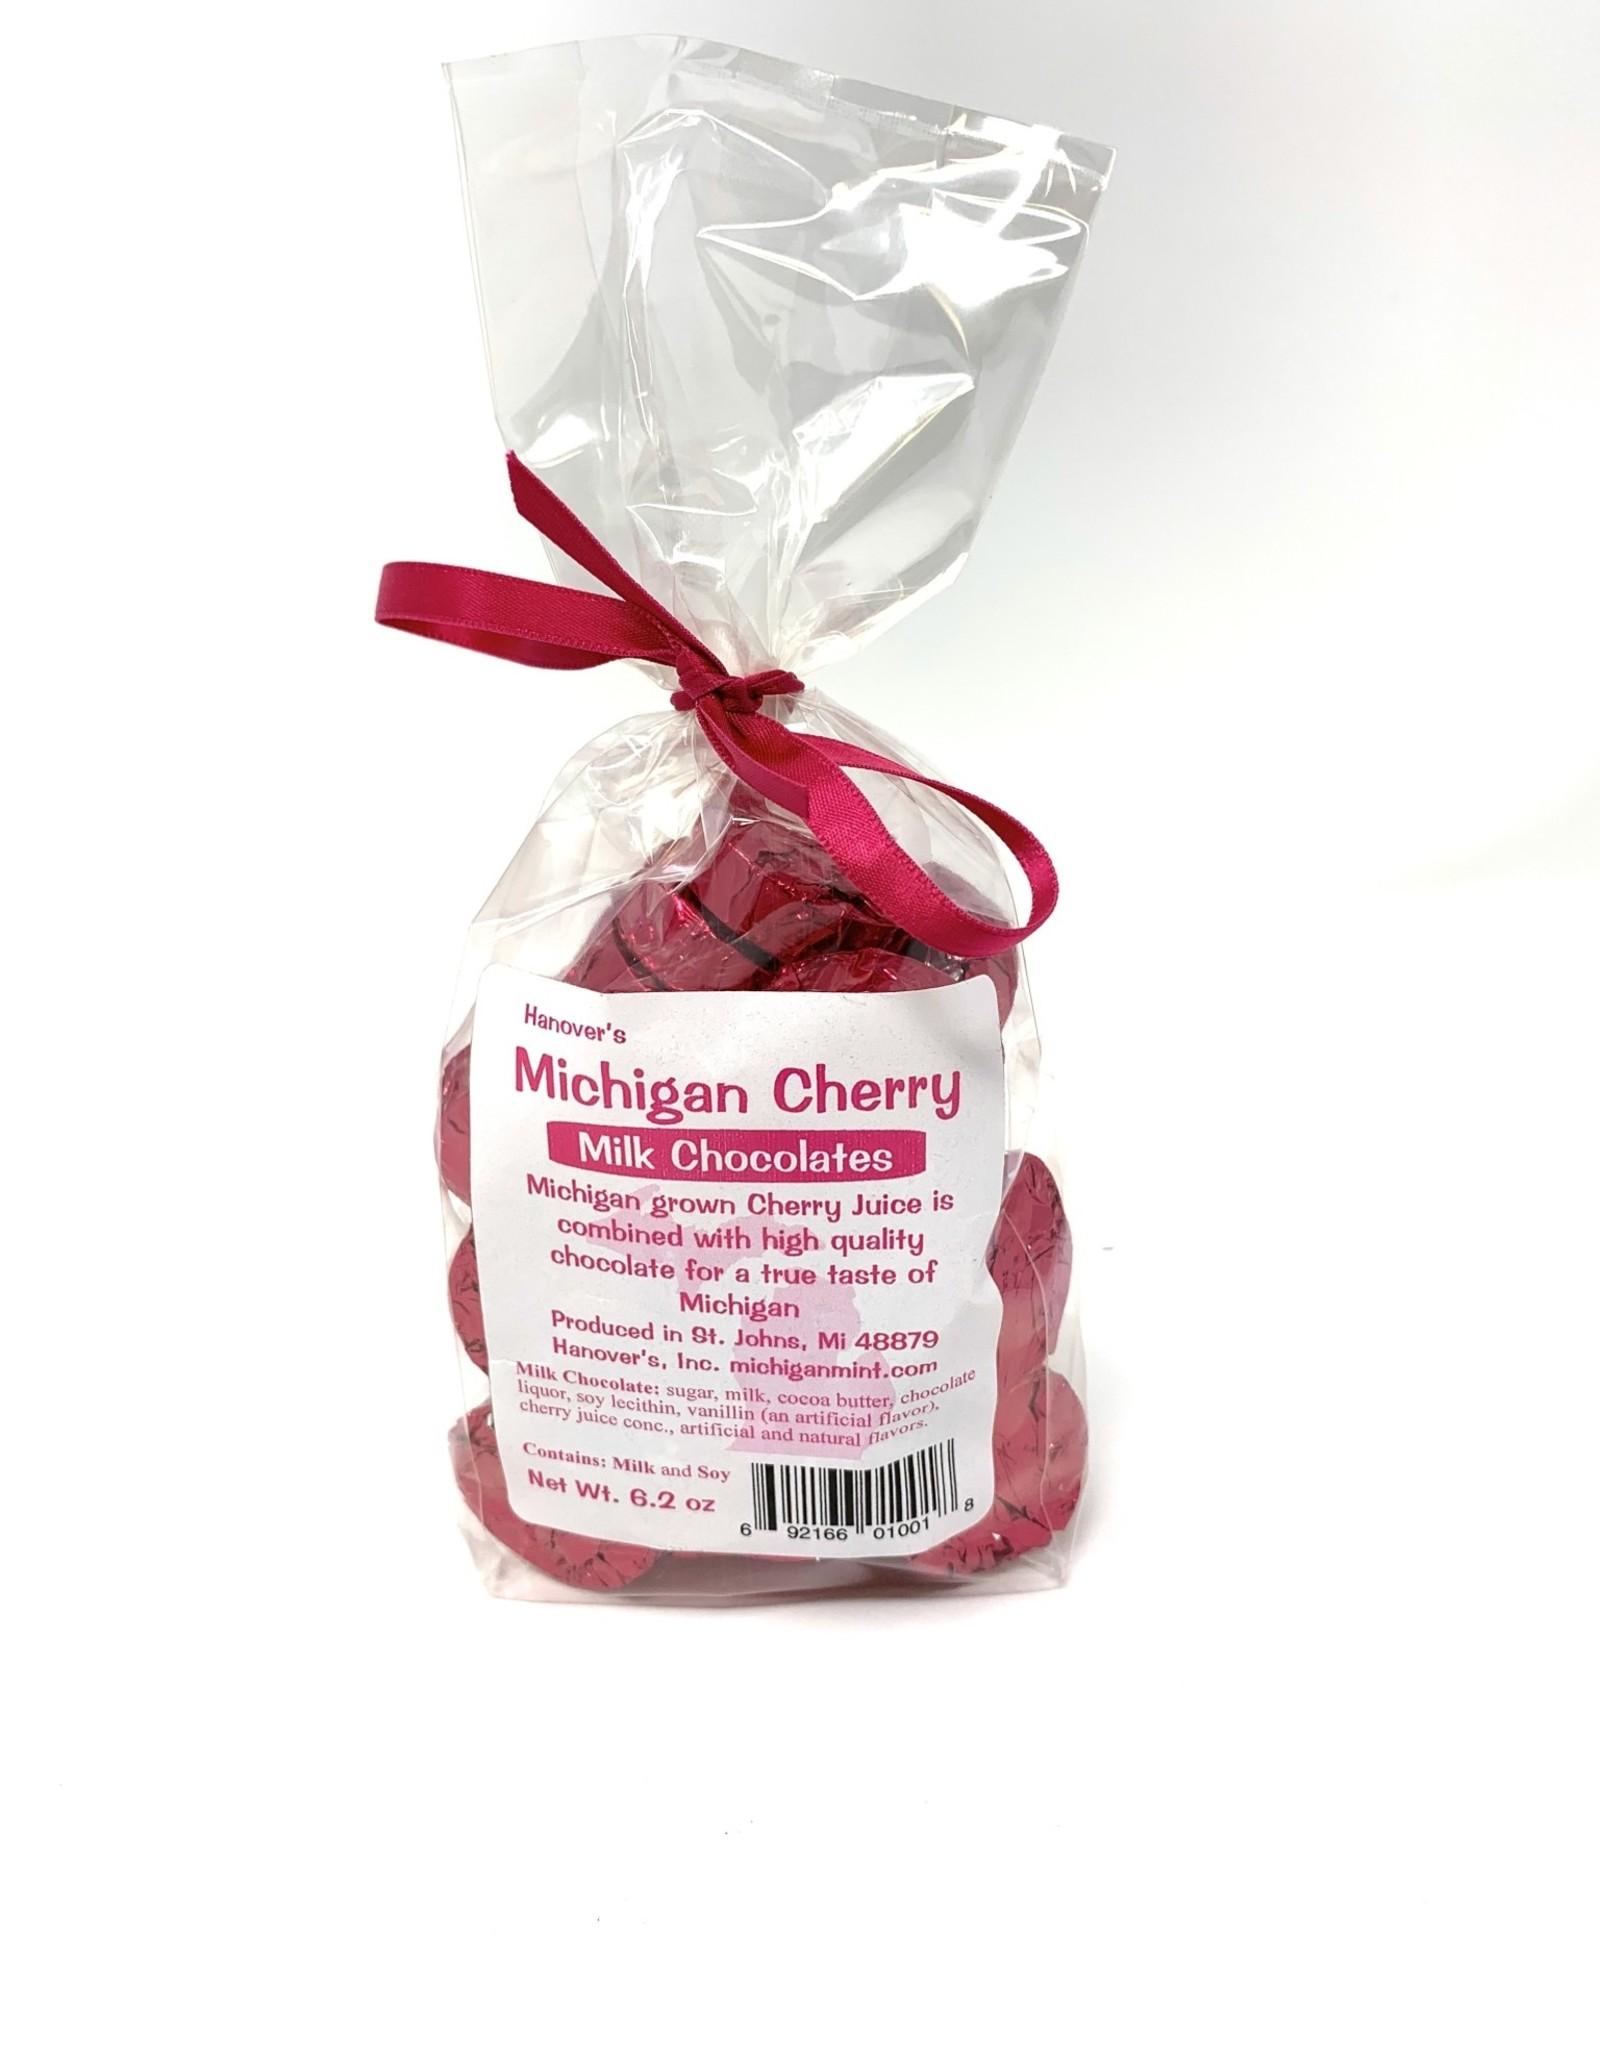 Hanover's Michigan Mints Michigan Mints Cherry Milk Chocolate